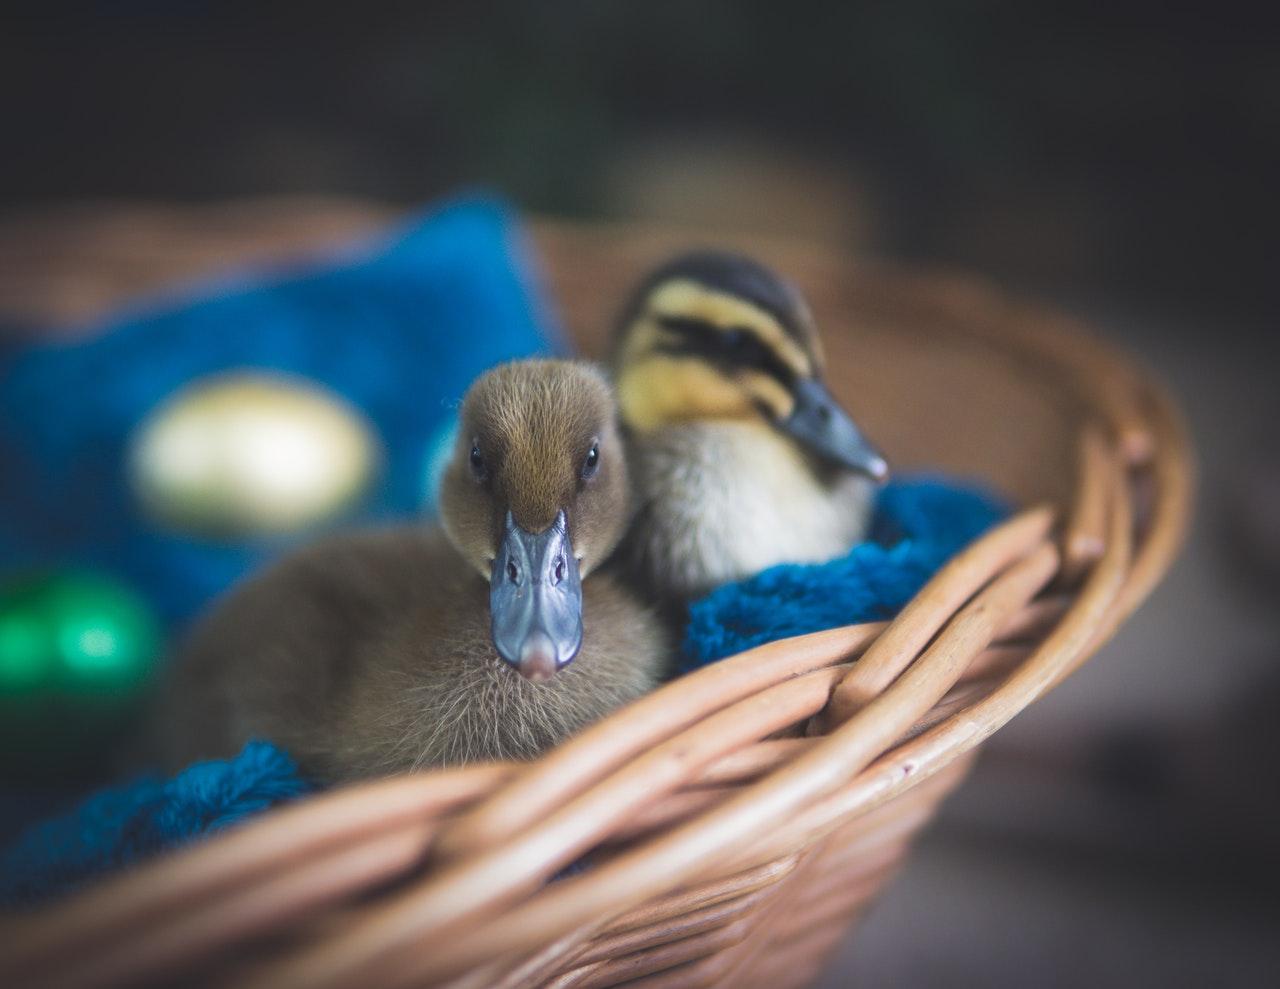 Cute ducklings in a basket